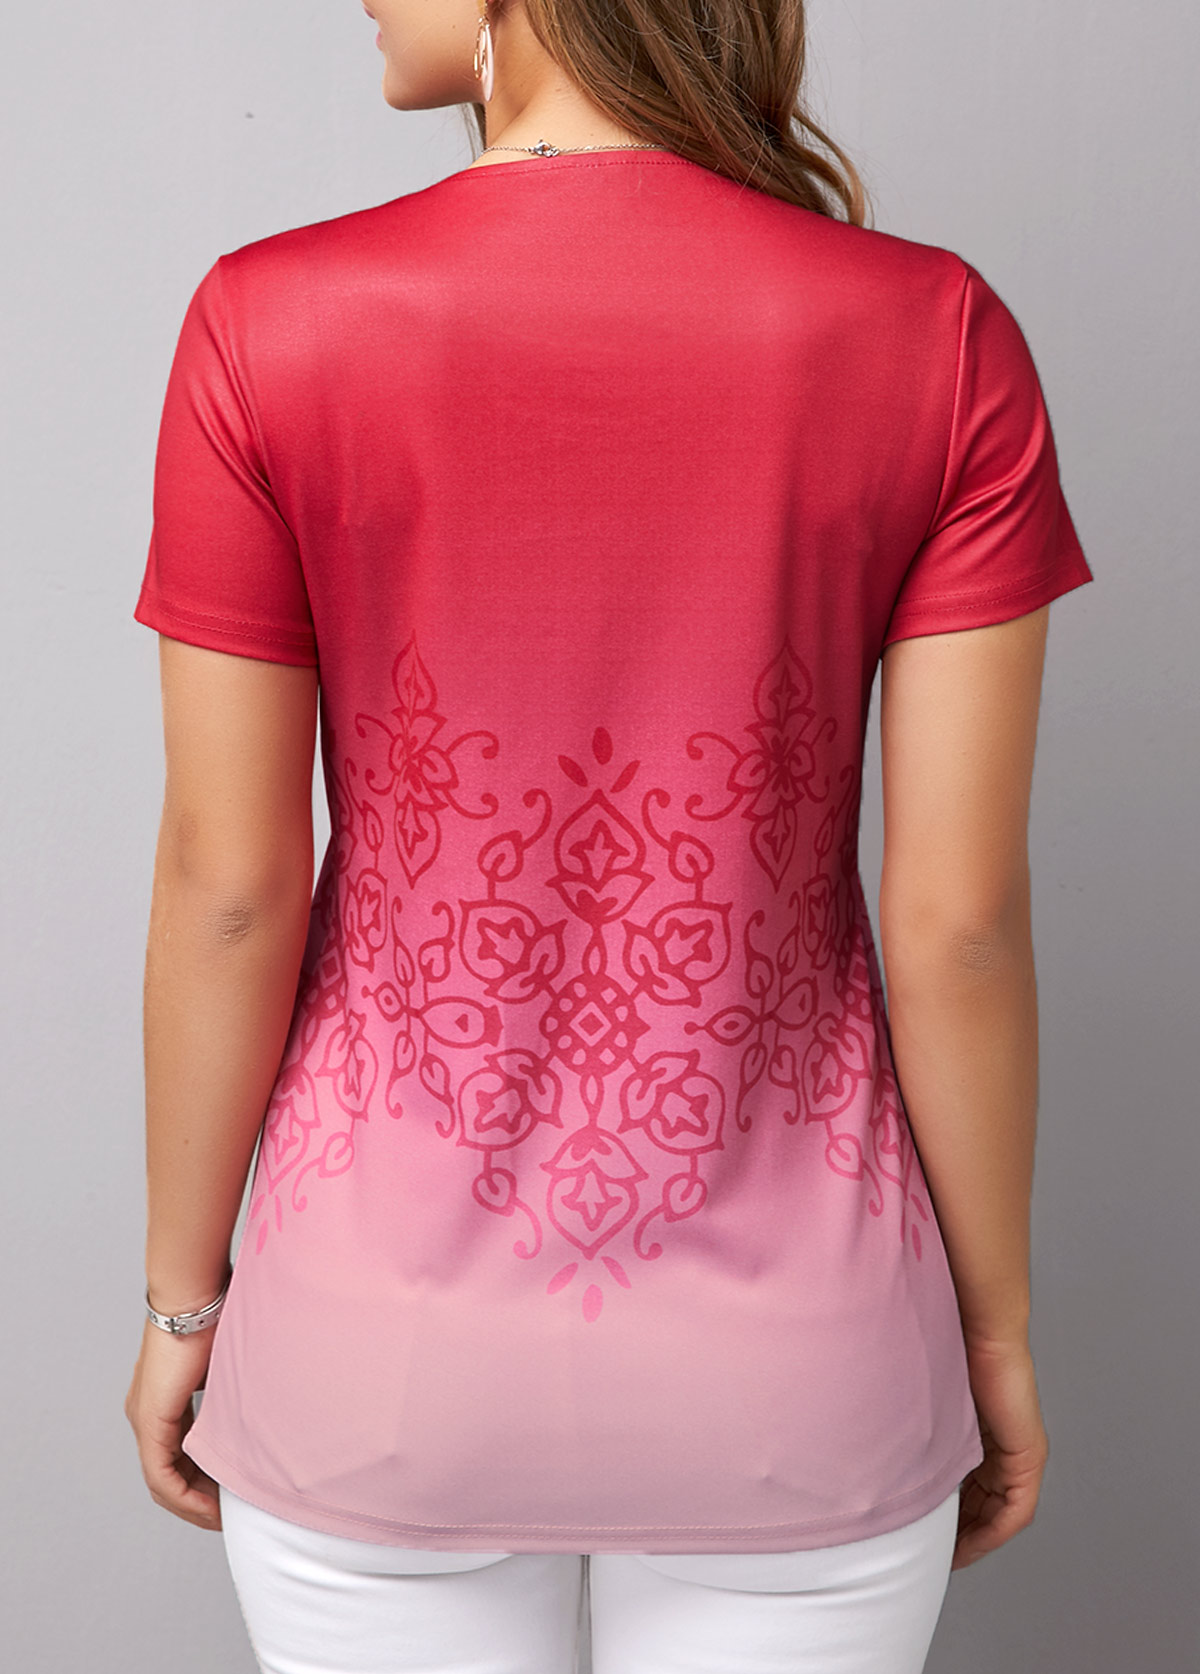 Crinkle Chest Round Neck Gradient T Shirt